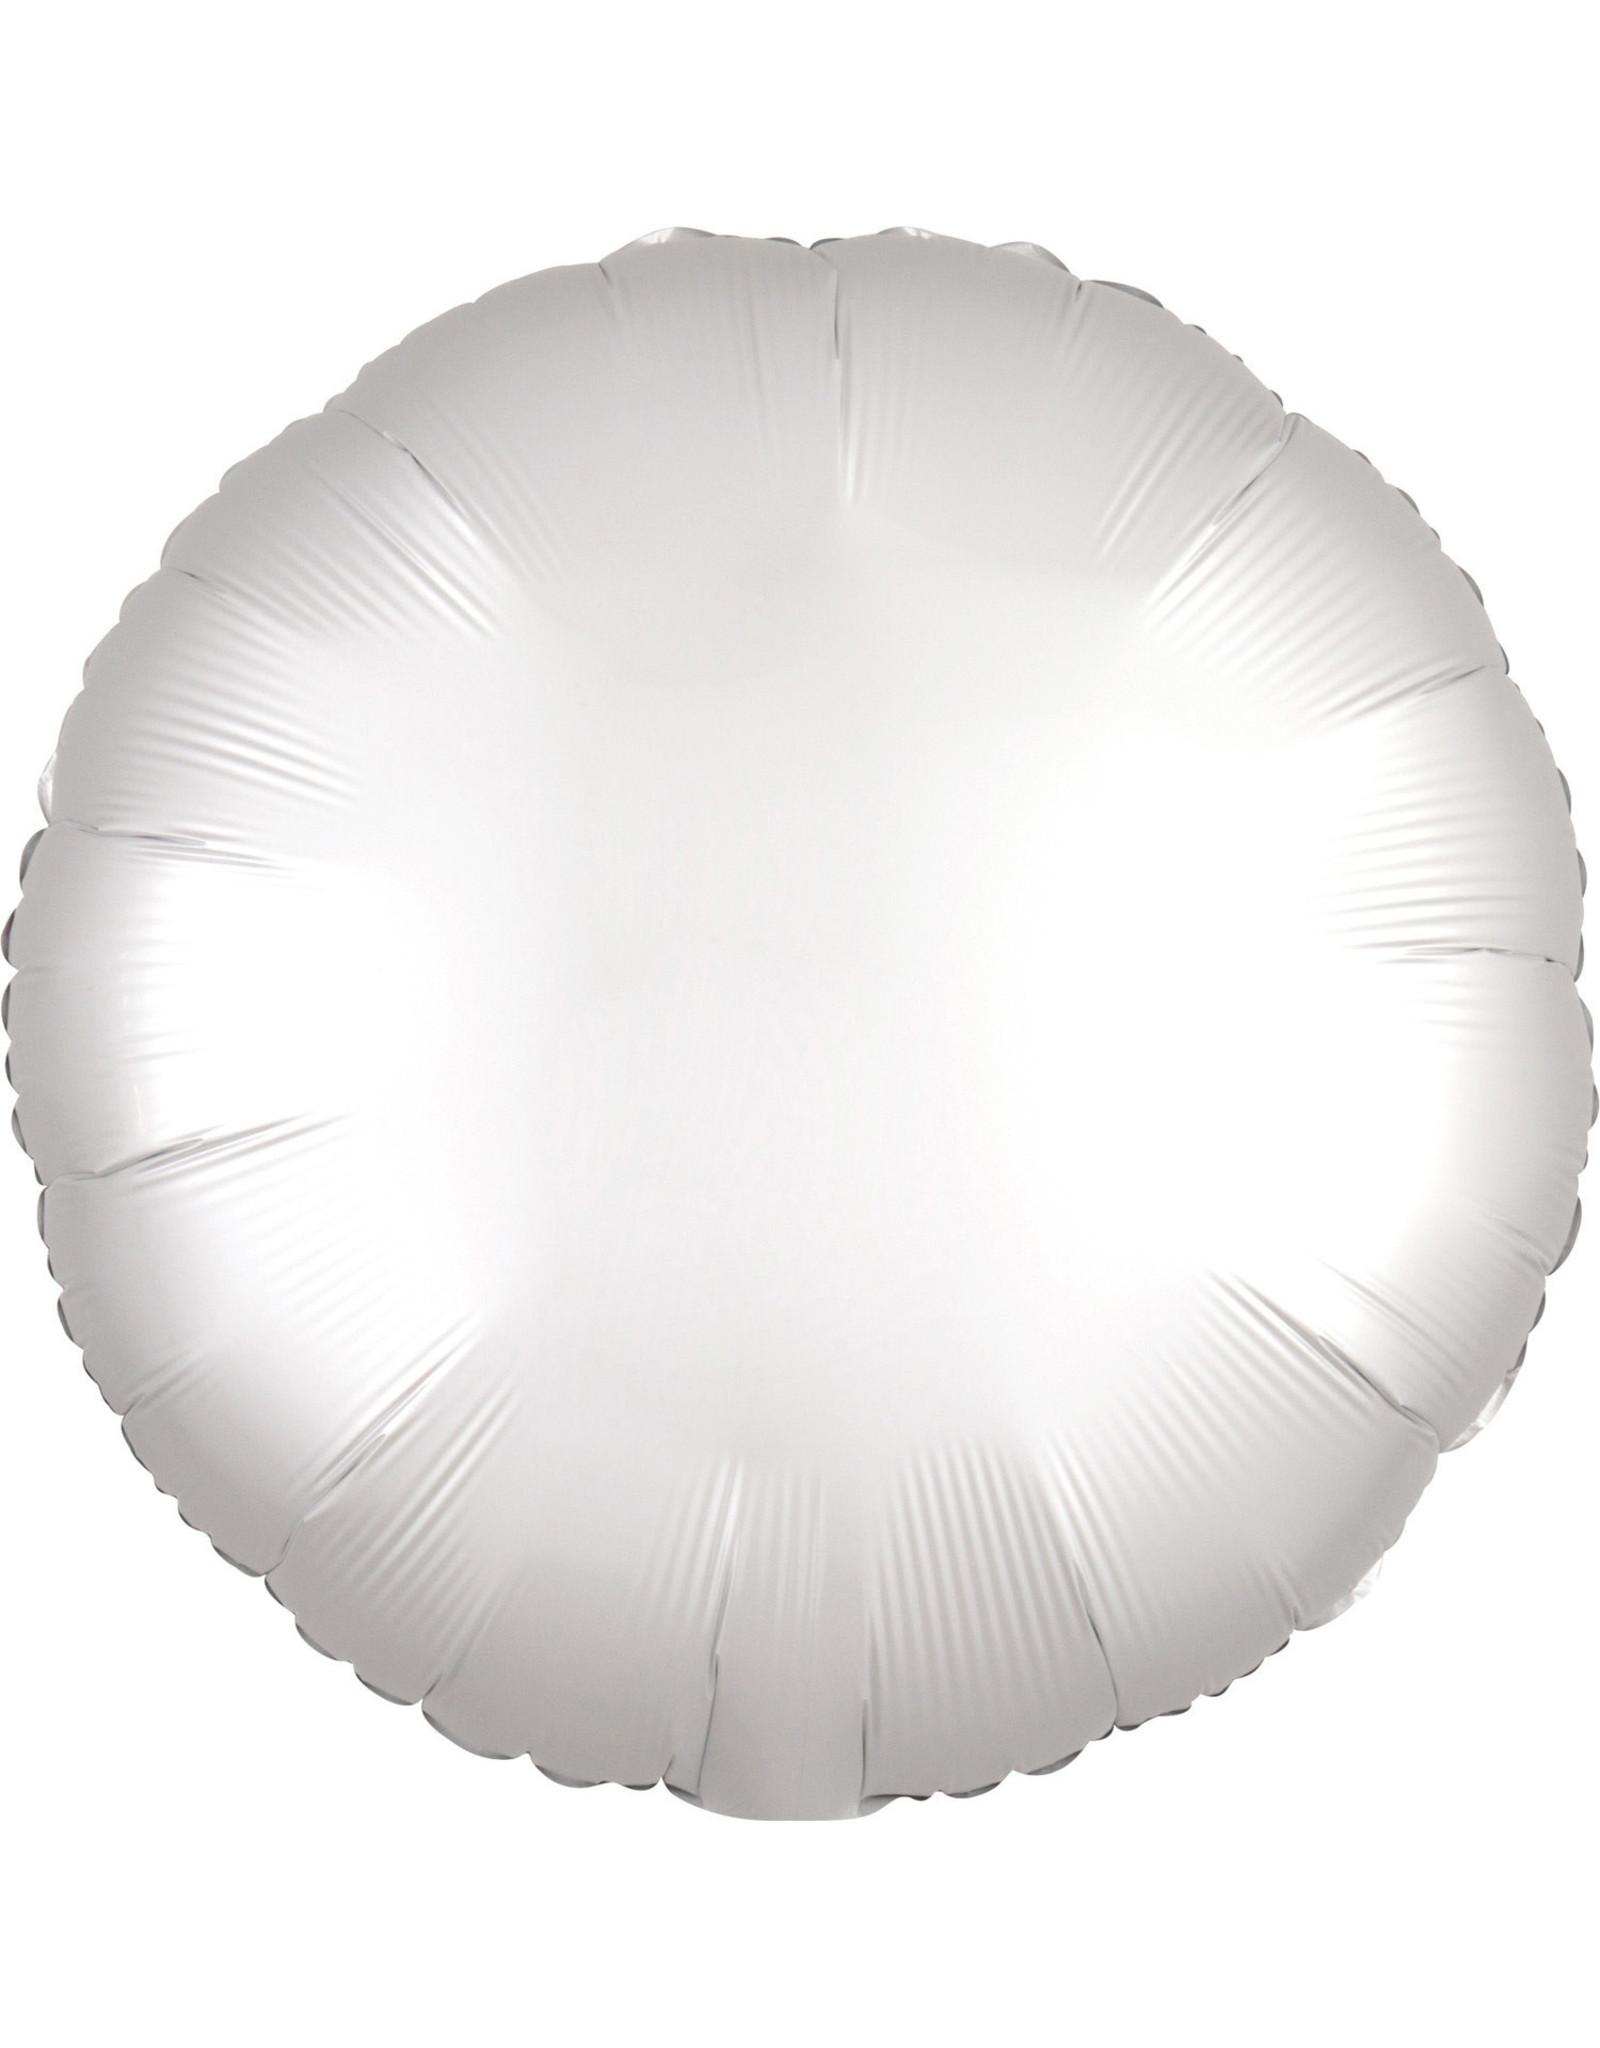 Amscan folieballon wit mat rond 43 cm